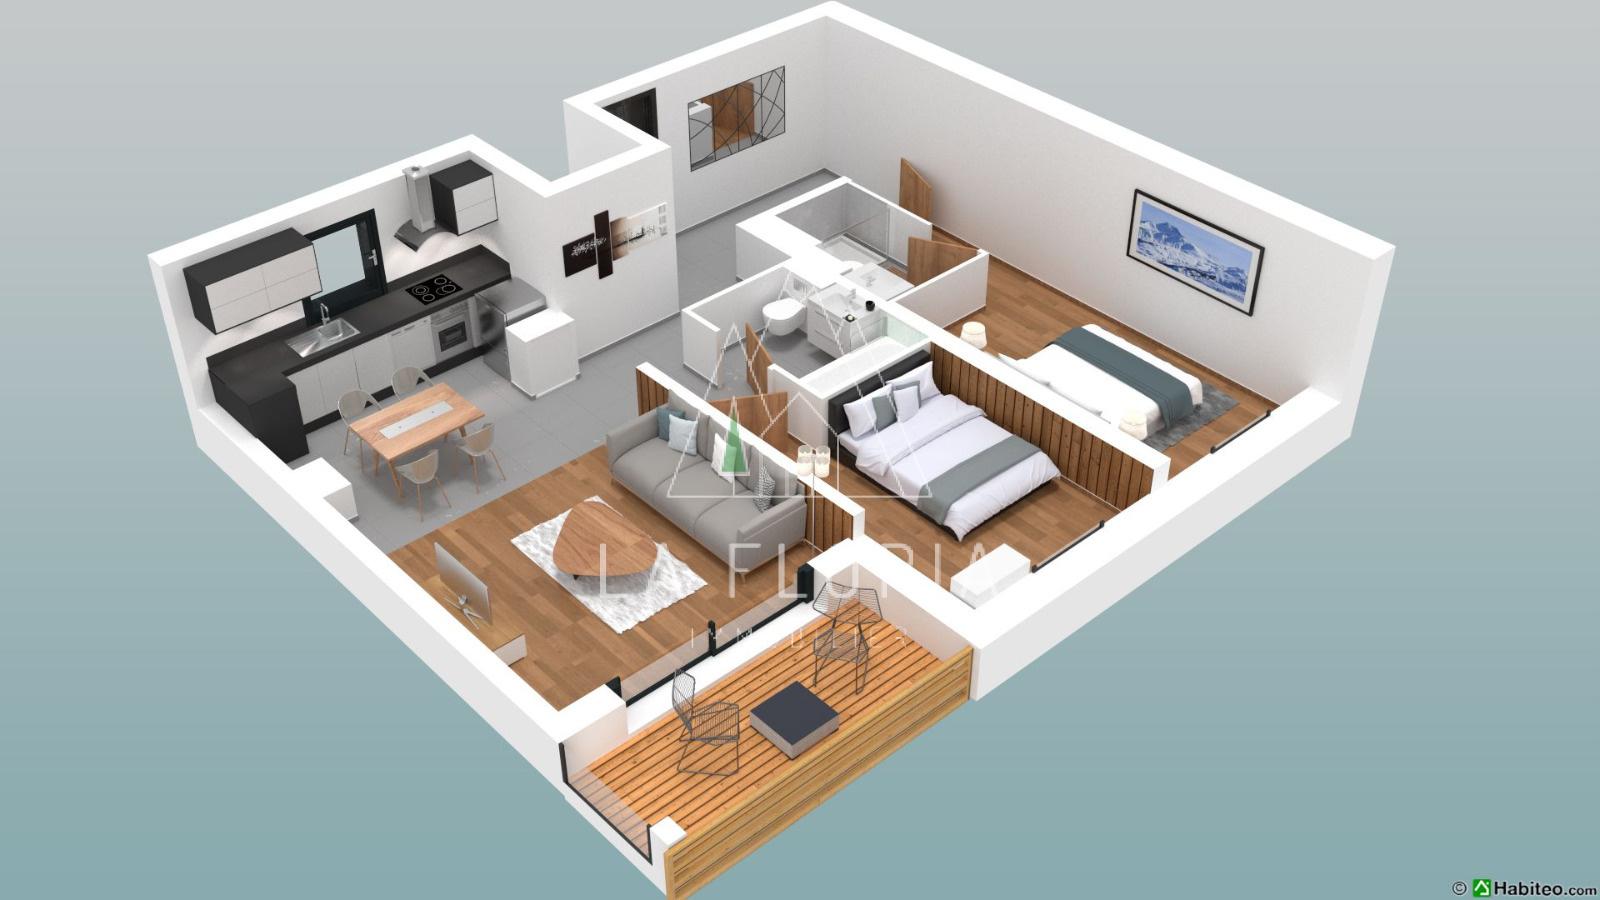 2 BEDROOM 63 M2 APARTMENT IN NEW UPMARKET DEVELOPMENT, CHAMONIX LES PRAZ